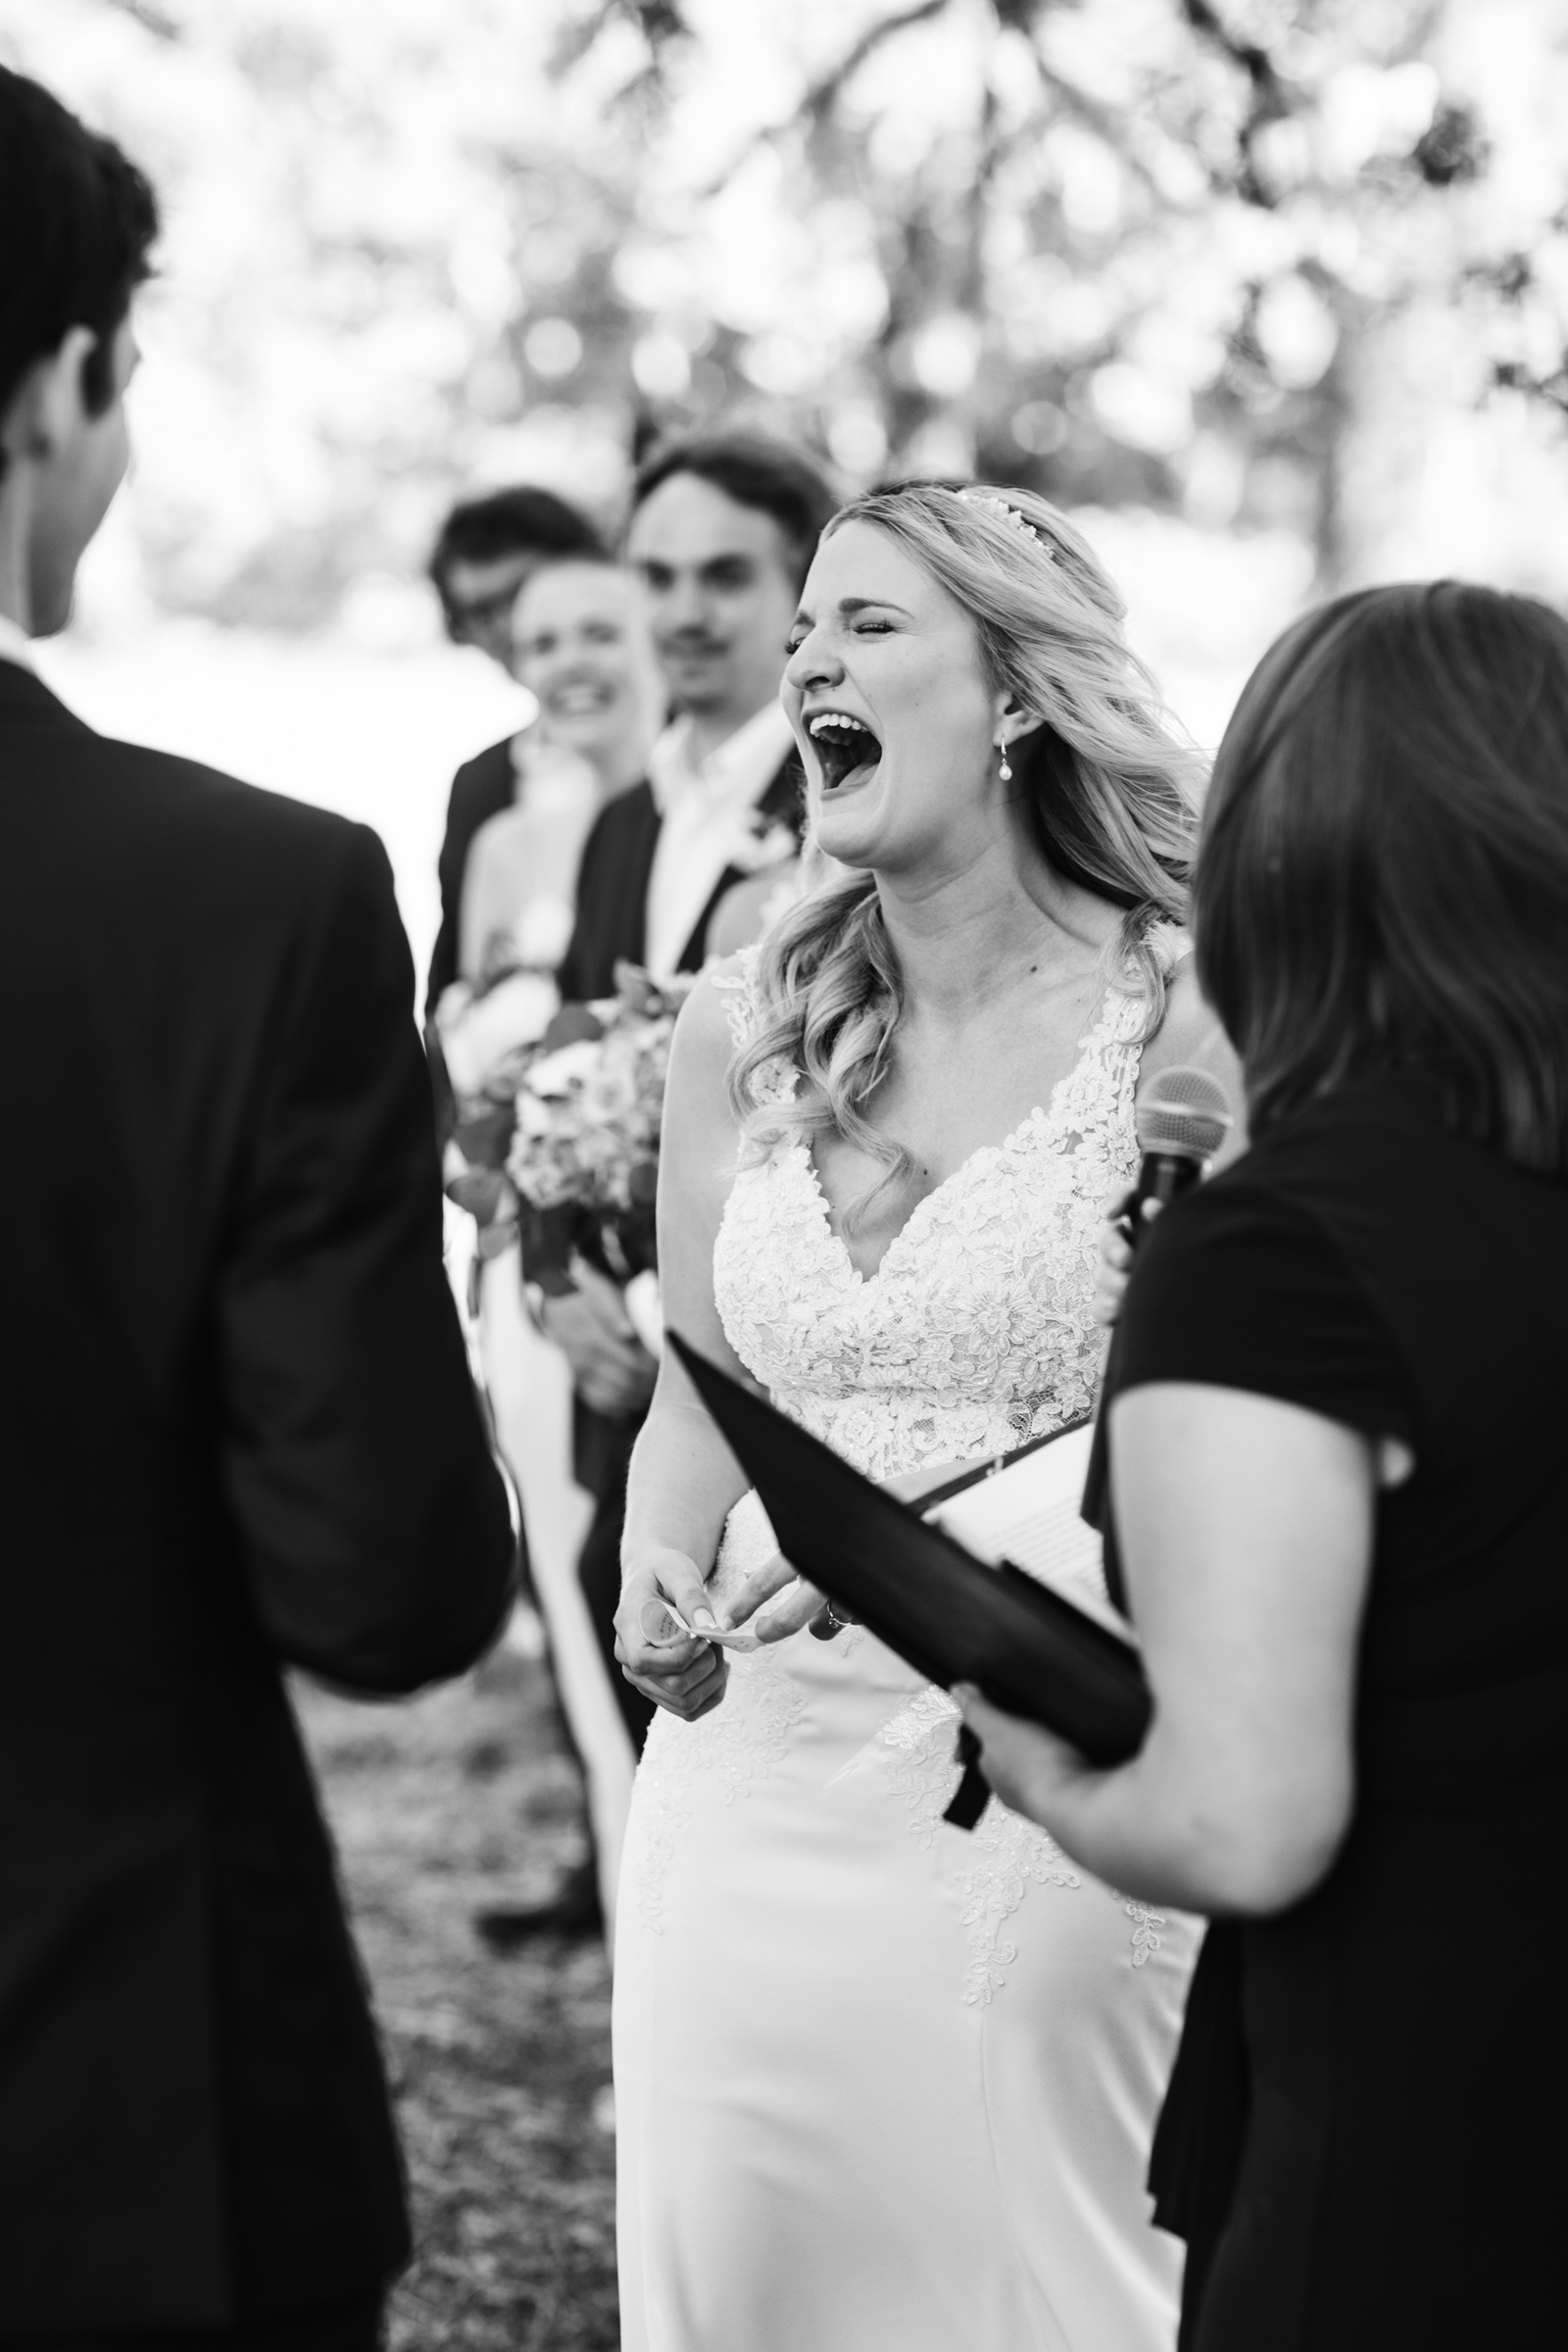 054-daronjackson-rachel-michael-wedding-mtpisgah.jpg